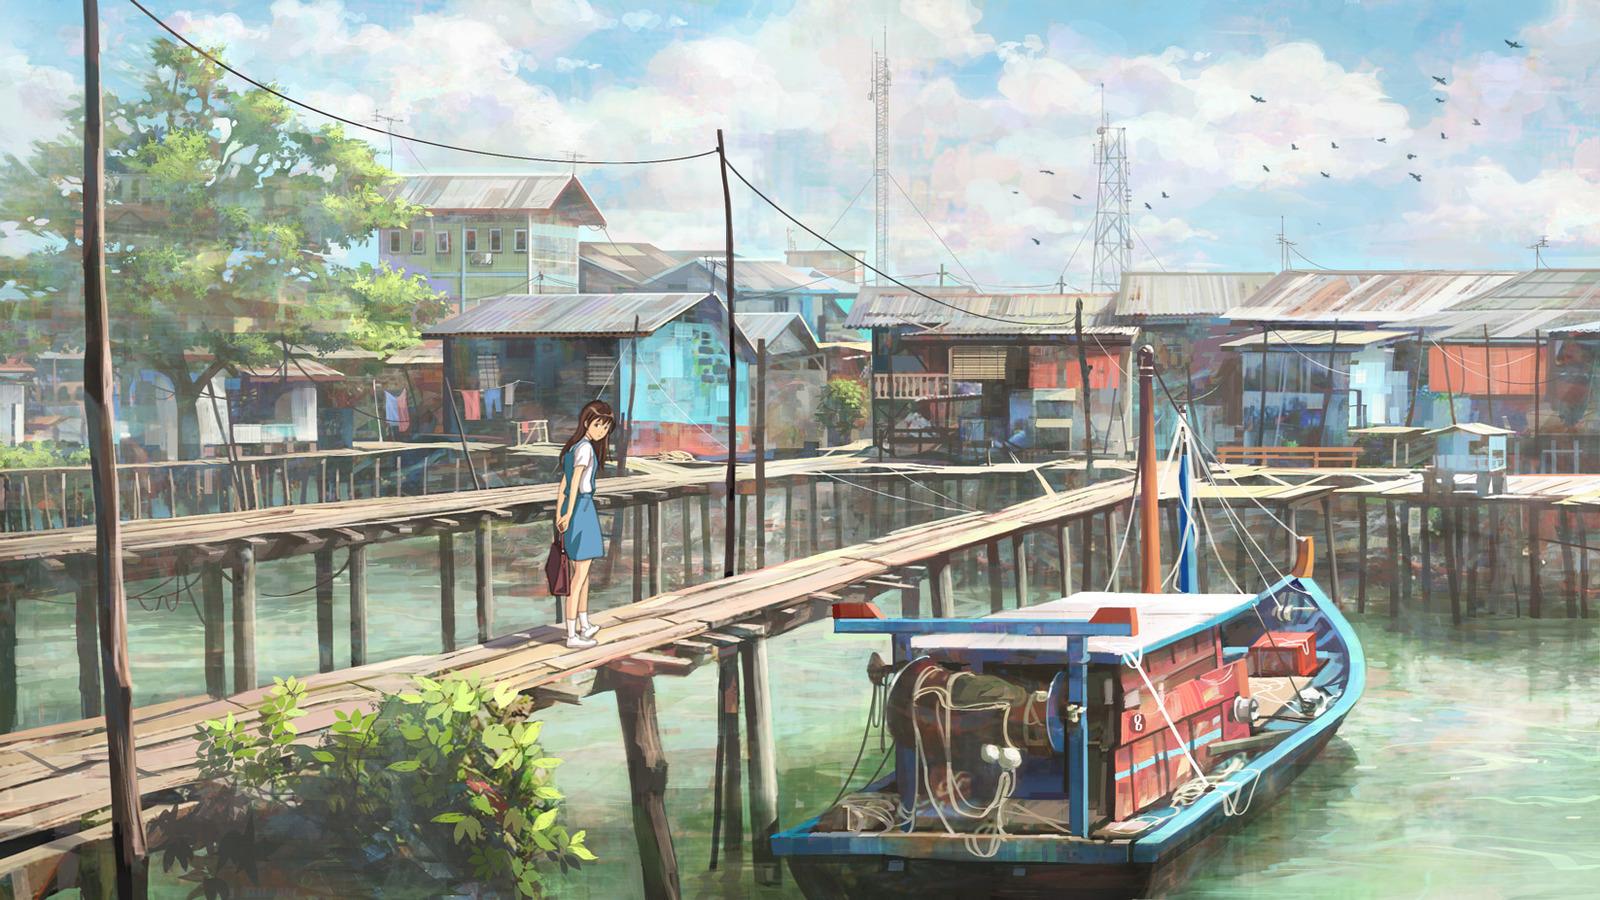 Drawn scenic anime Fishing Image Village for landscape